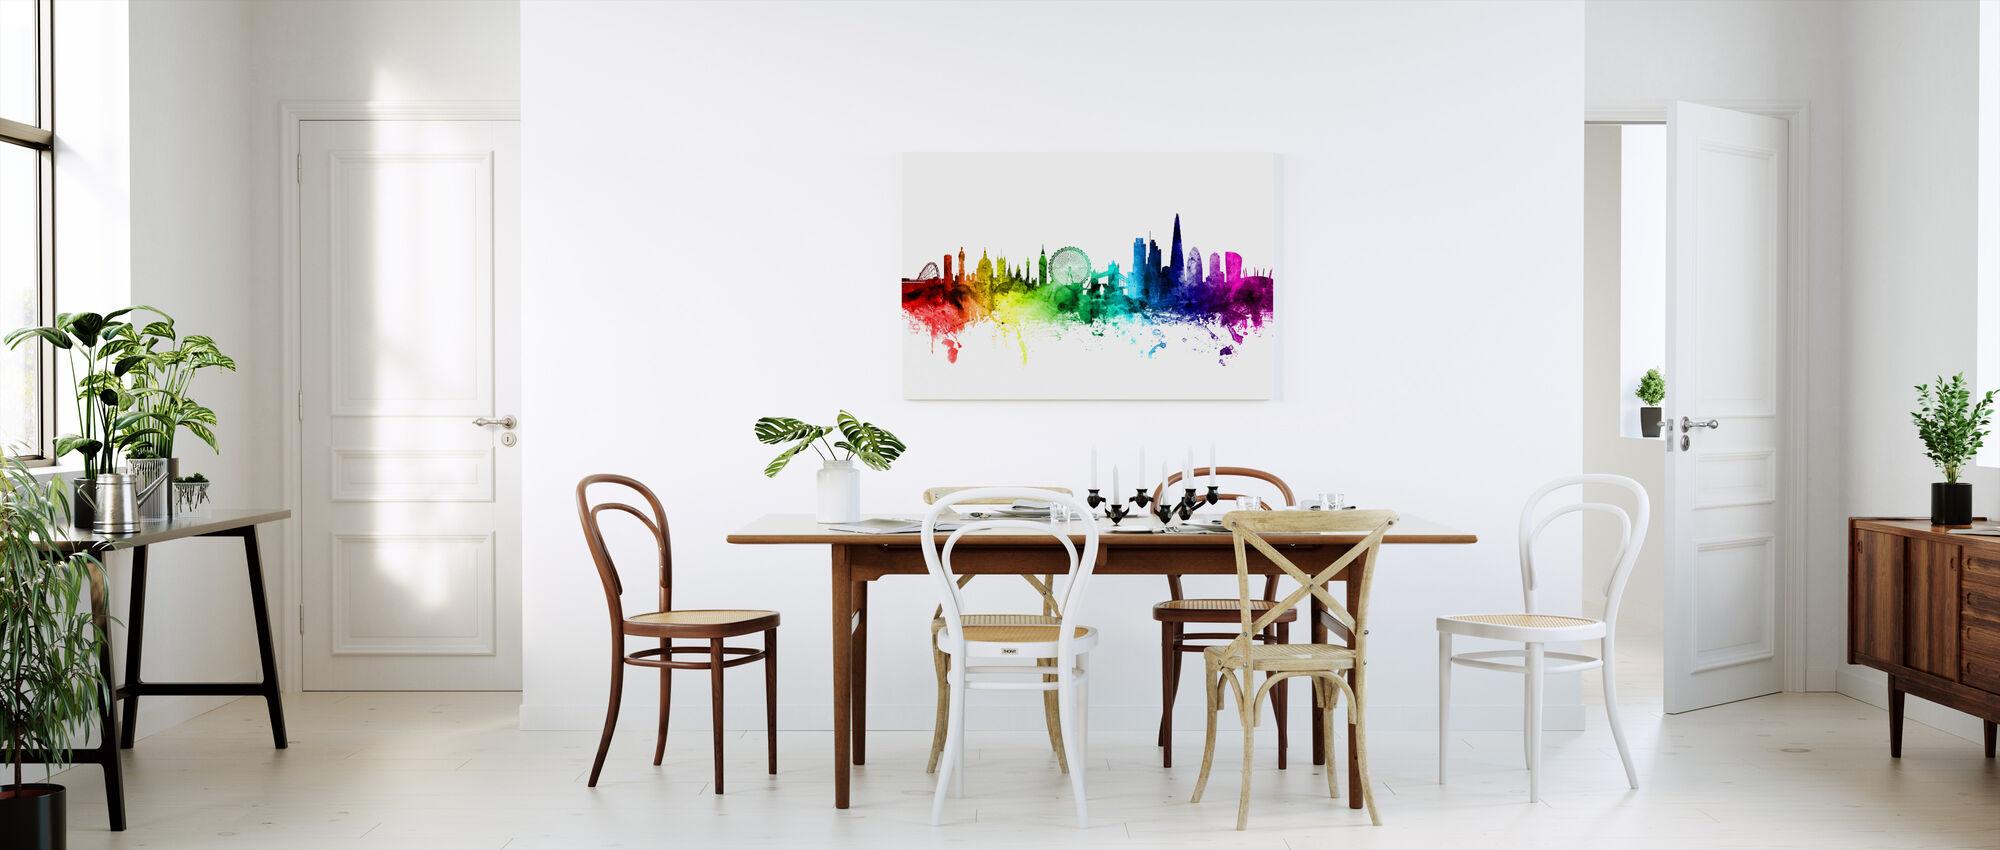 London Skyline Rainbow - Canvastavla - Kök